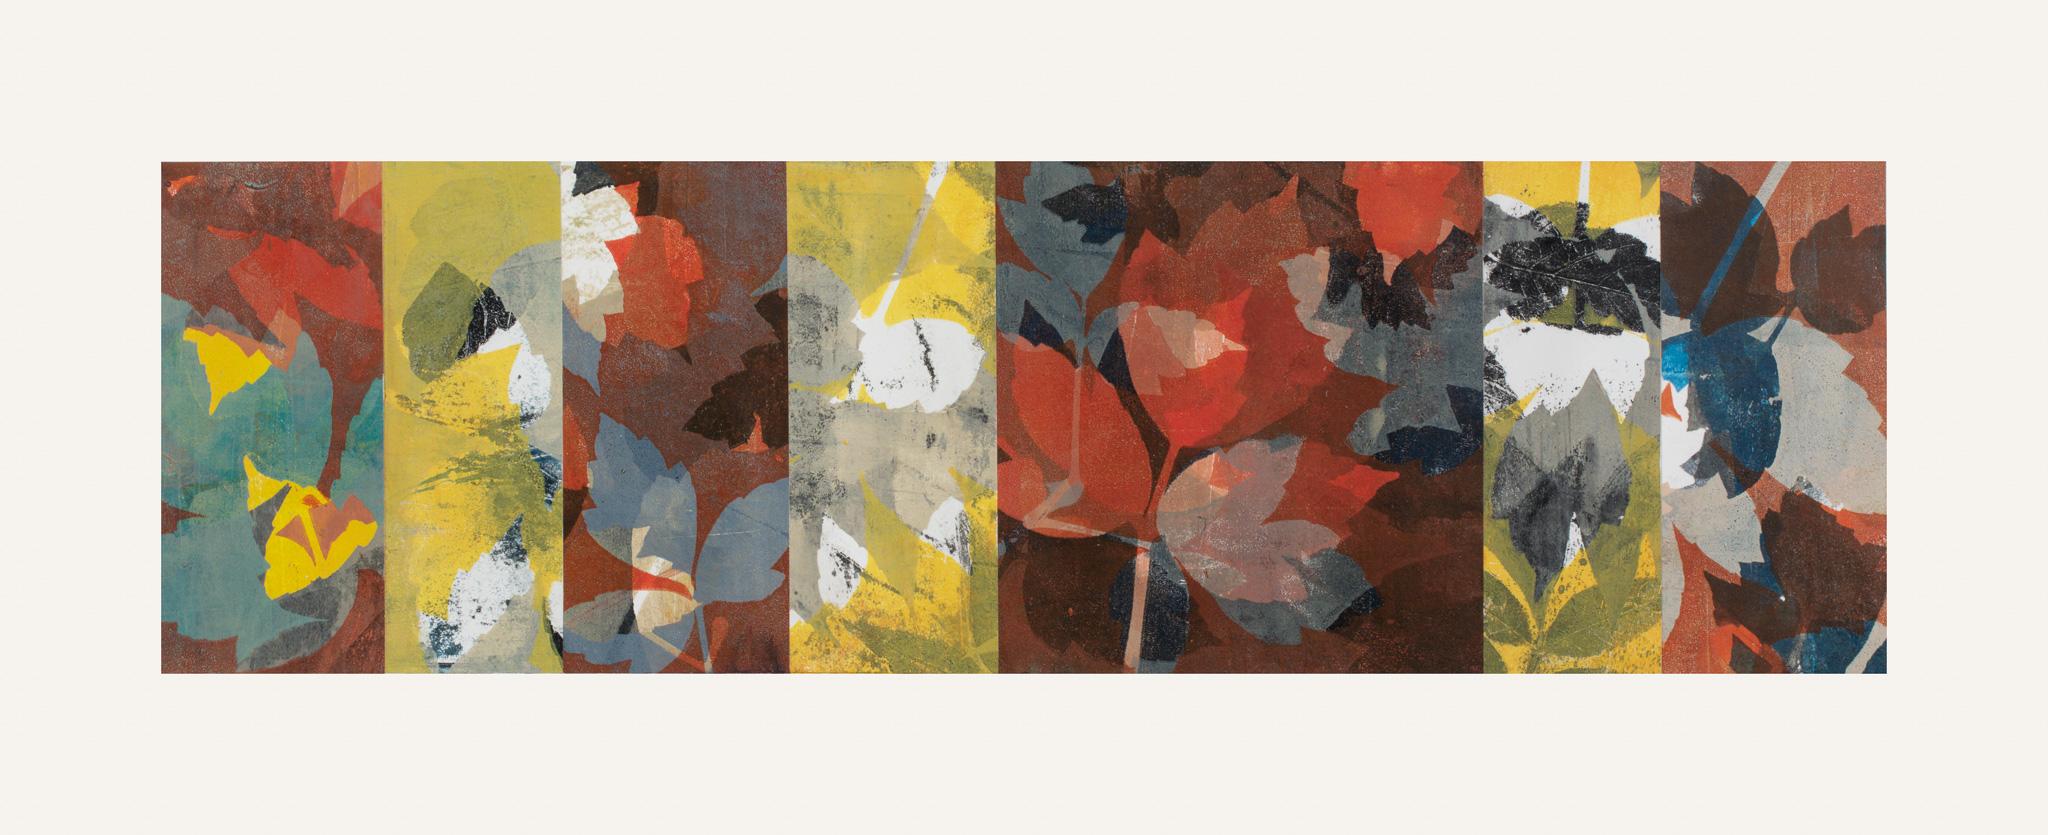 "Autumn Haze 5, 11"" x 30,"" Monoprint collage"